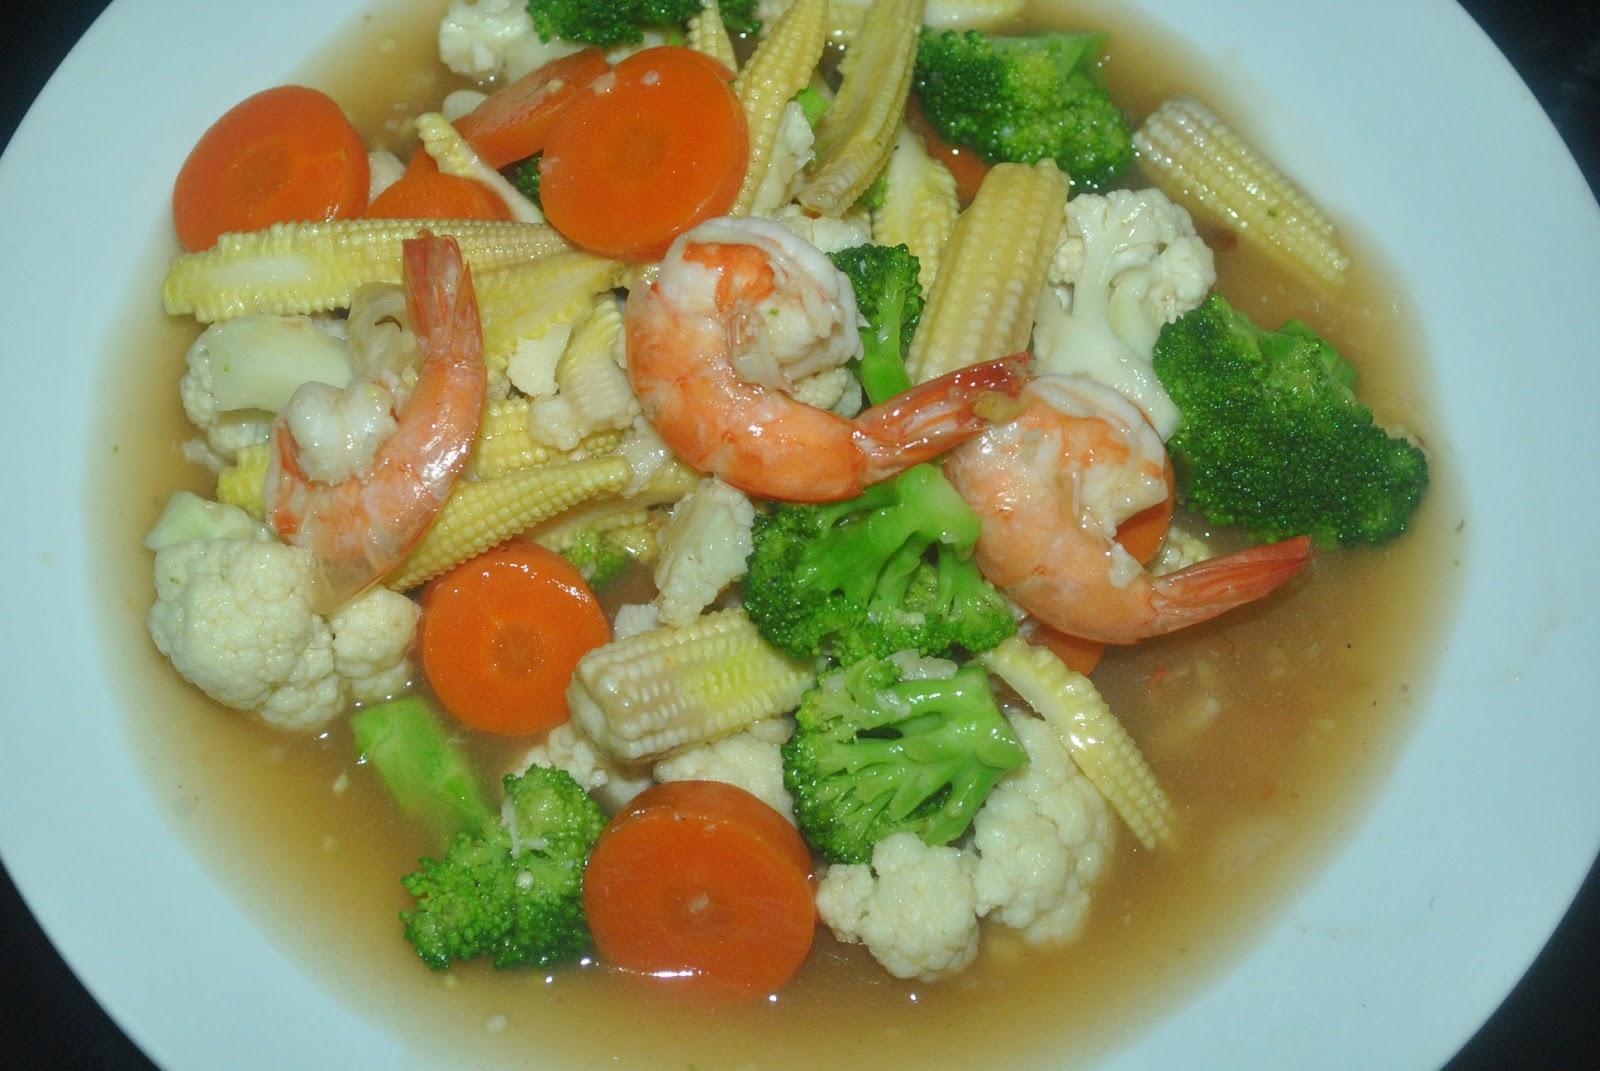 Patyskitchen Oyster Sauce Mixed Vegetables Sayur Campur Sos Tiram